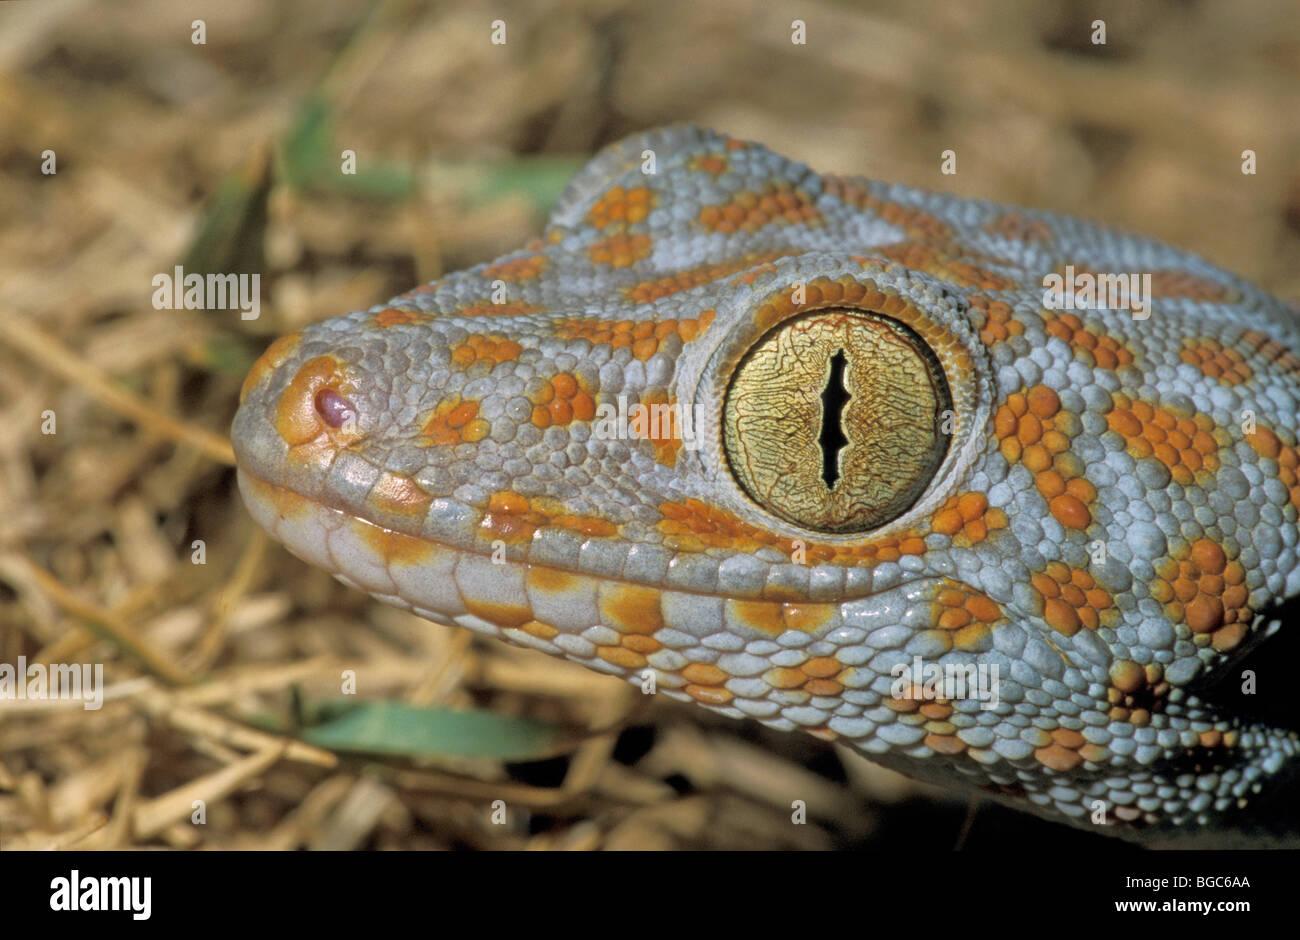 Gekko Gecko Stock Photos Amp Gekko Gecko Stock Images Alamy